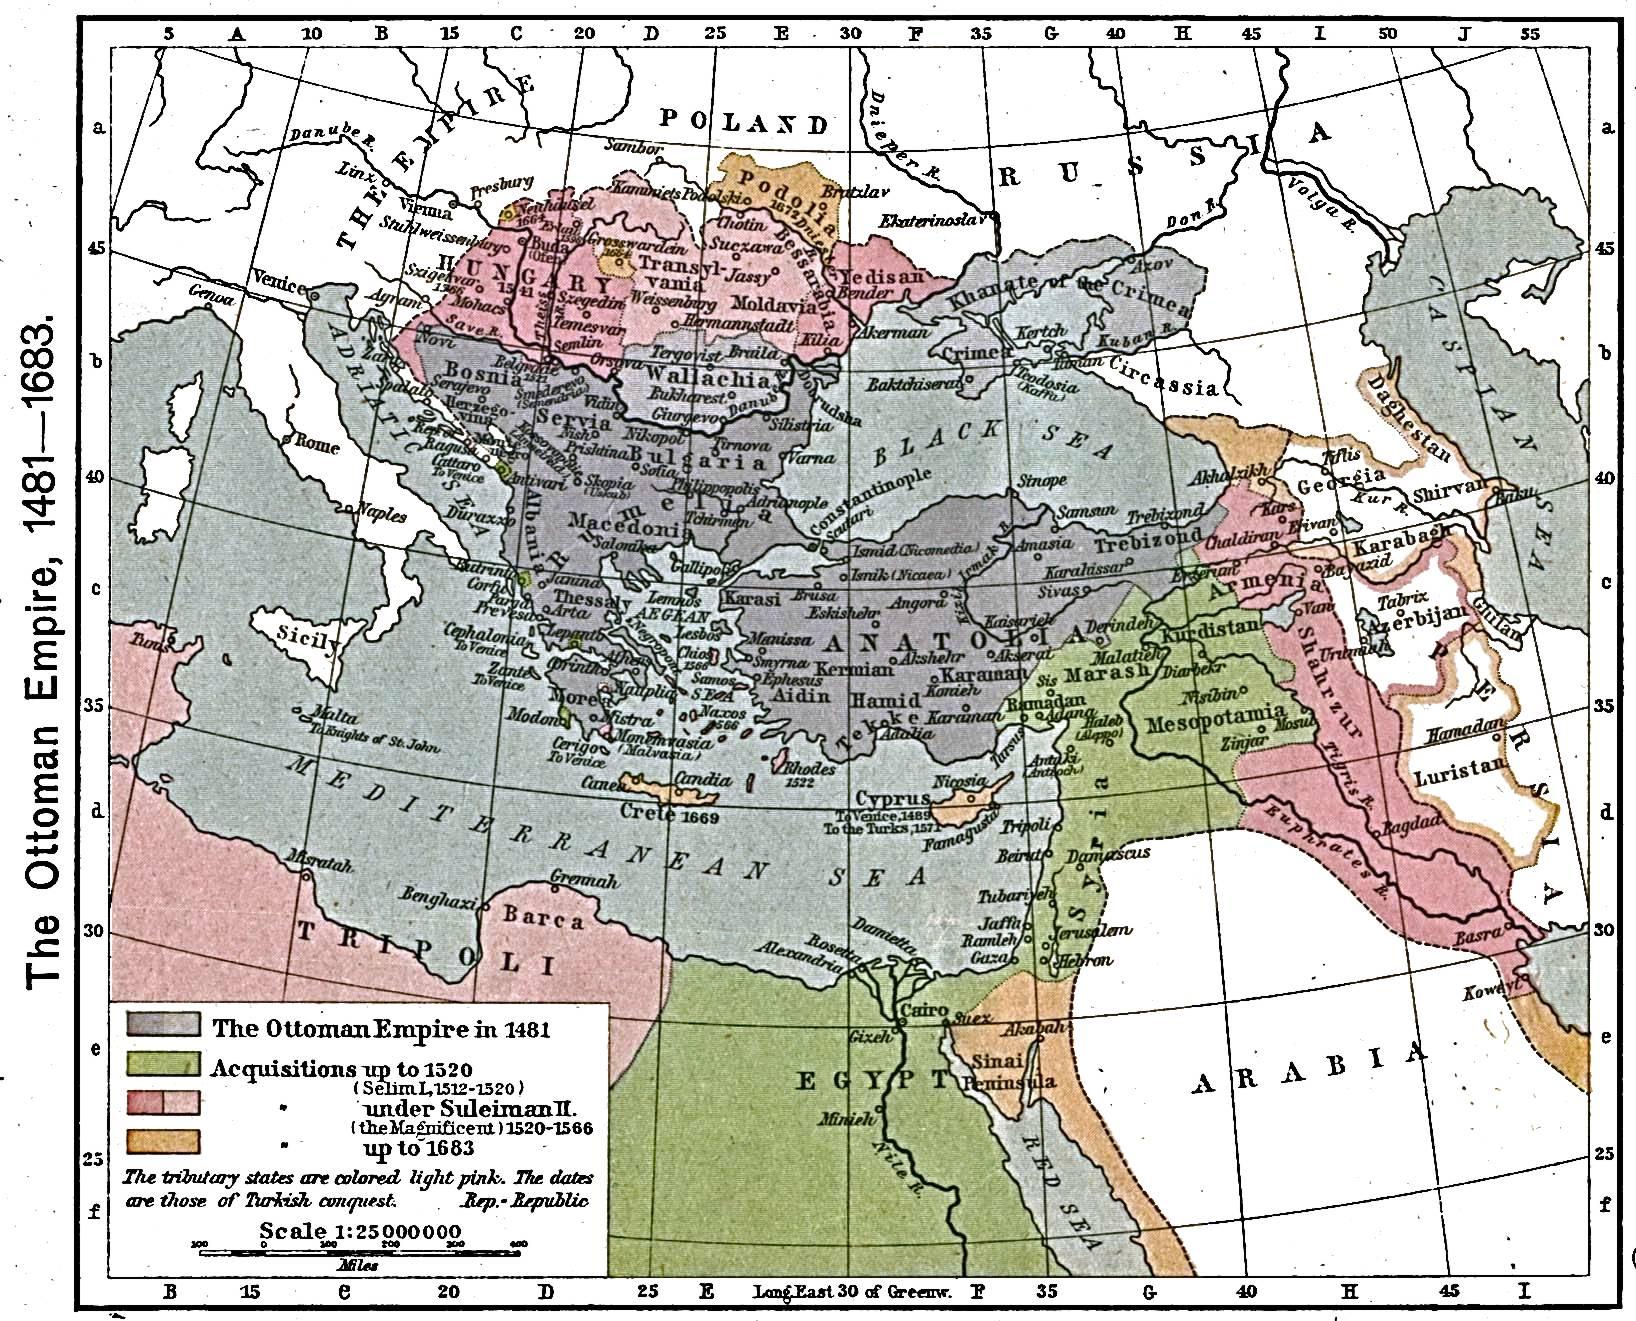 Ottoman_empire_1481-1683.jpg